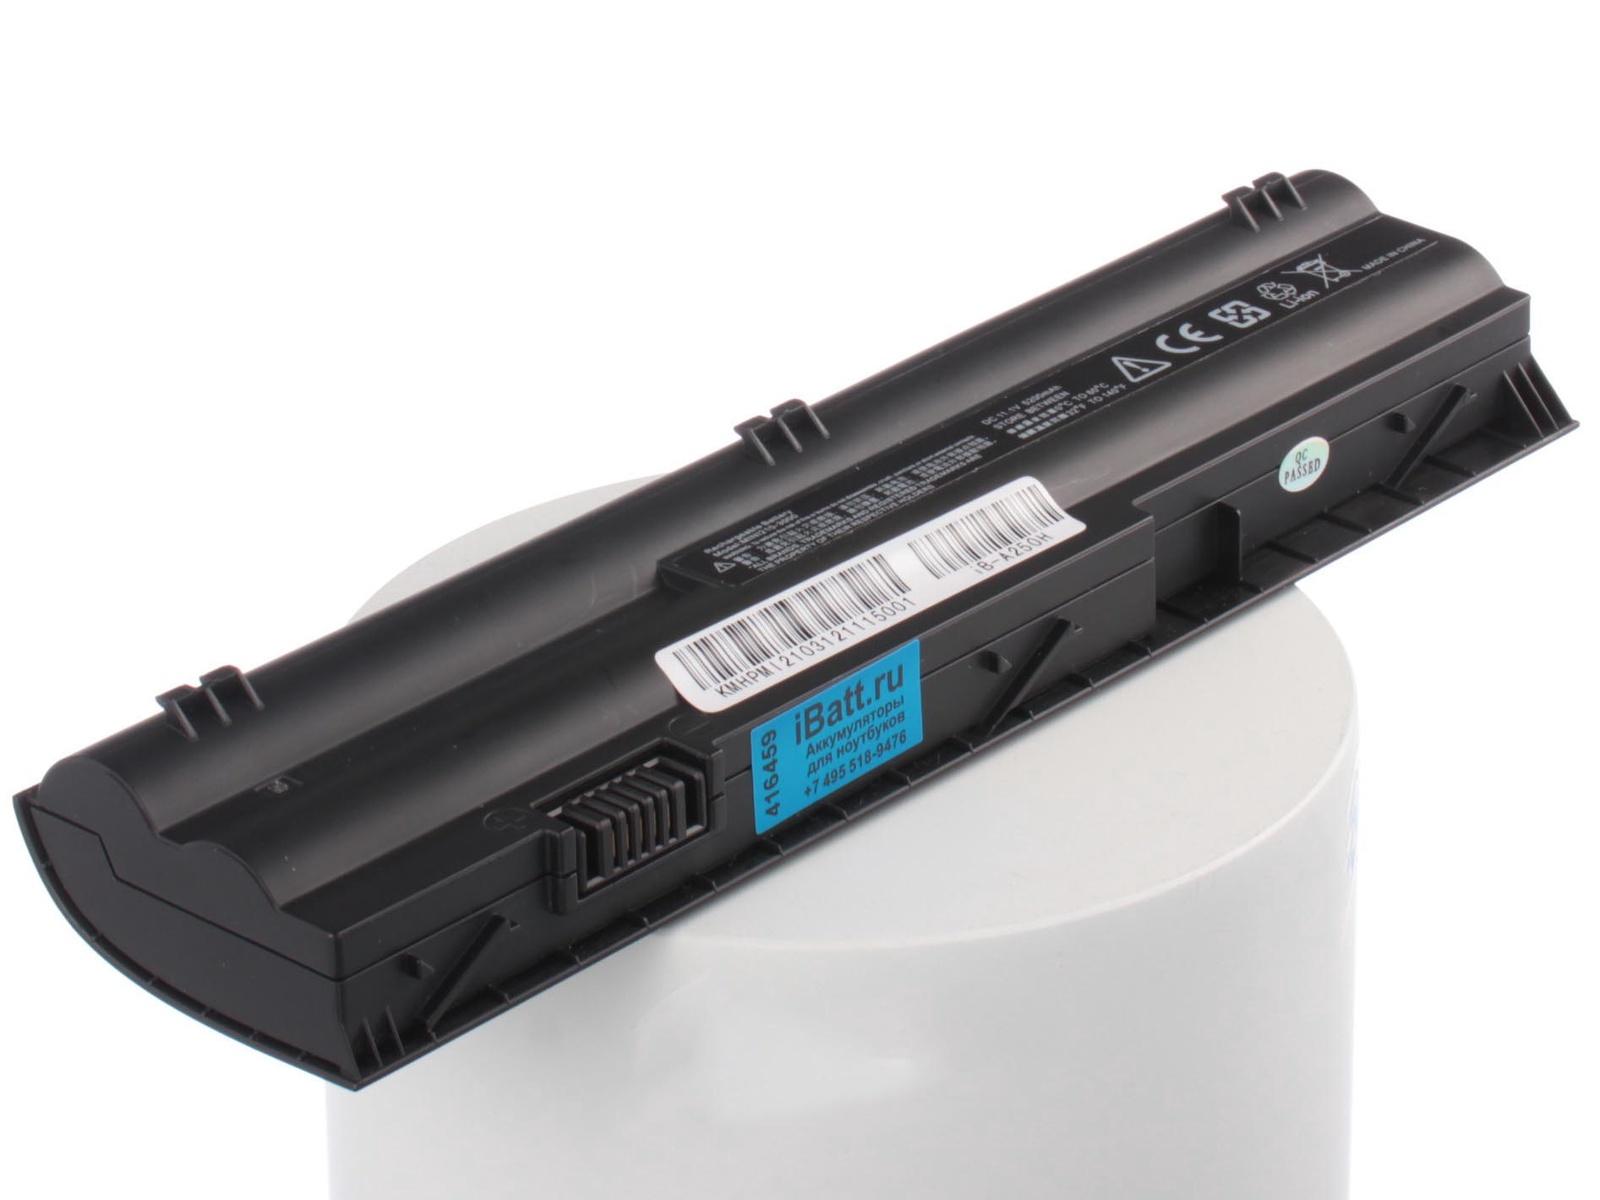 Аккумулятор для ноутбука iBatt для HP-Compaq Mini 210-3051er, Pavilion dm1-4000er, Mini 210-3052er, Mini 110-4101er, Pavilion dm1-4100er, Mini 210-3000er, Pavilion dm1-4001er, Mini 200-4251sr, Pavilion dm1-4300, Mini 210-3000 mini griptilian